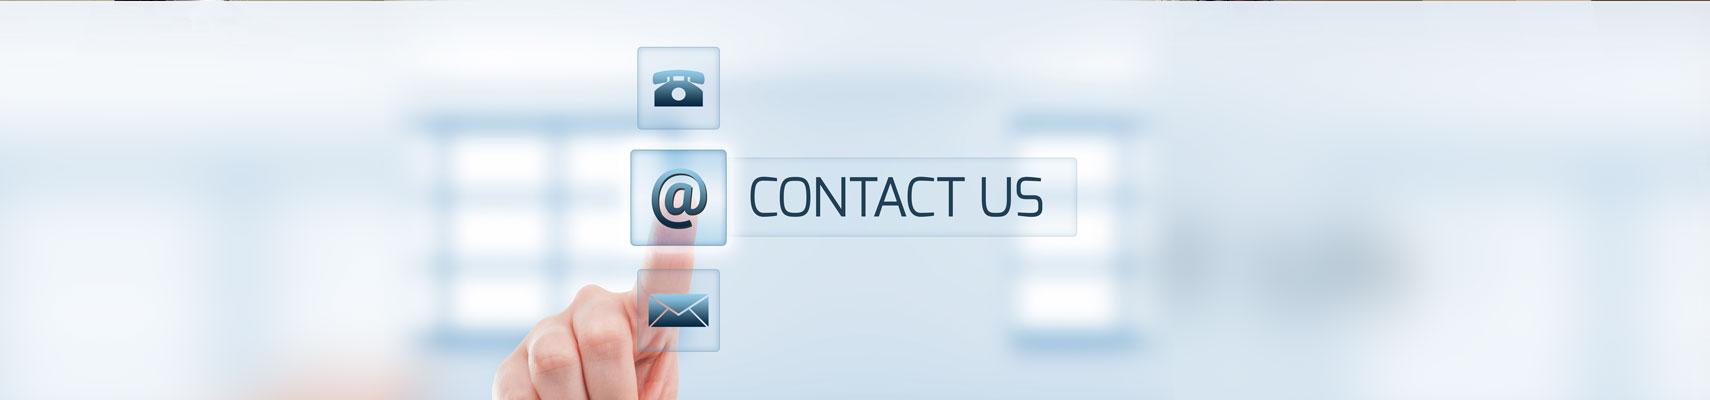 Nuhydro Contact Us